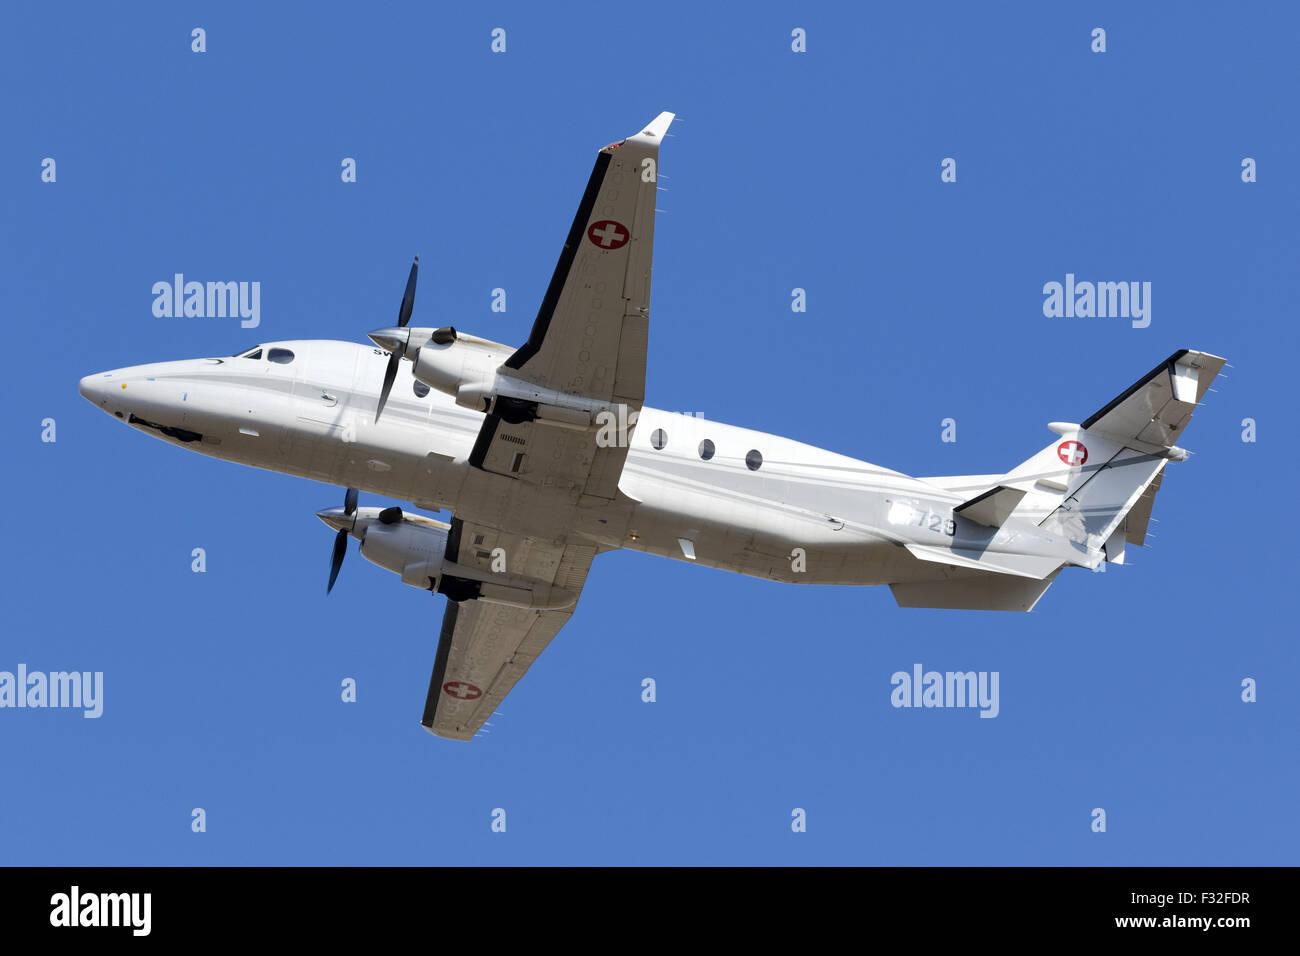 Switzerland Air Force Raytheon 1900D taking off runway 23. - Stock Image